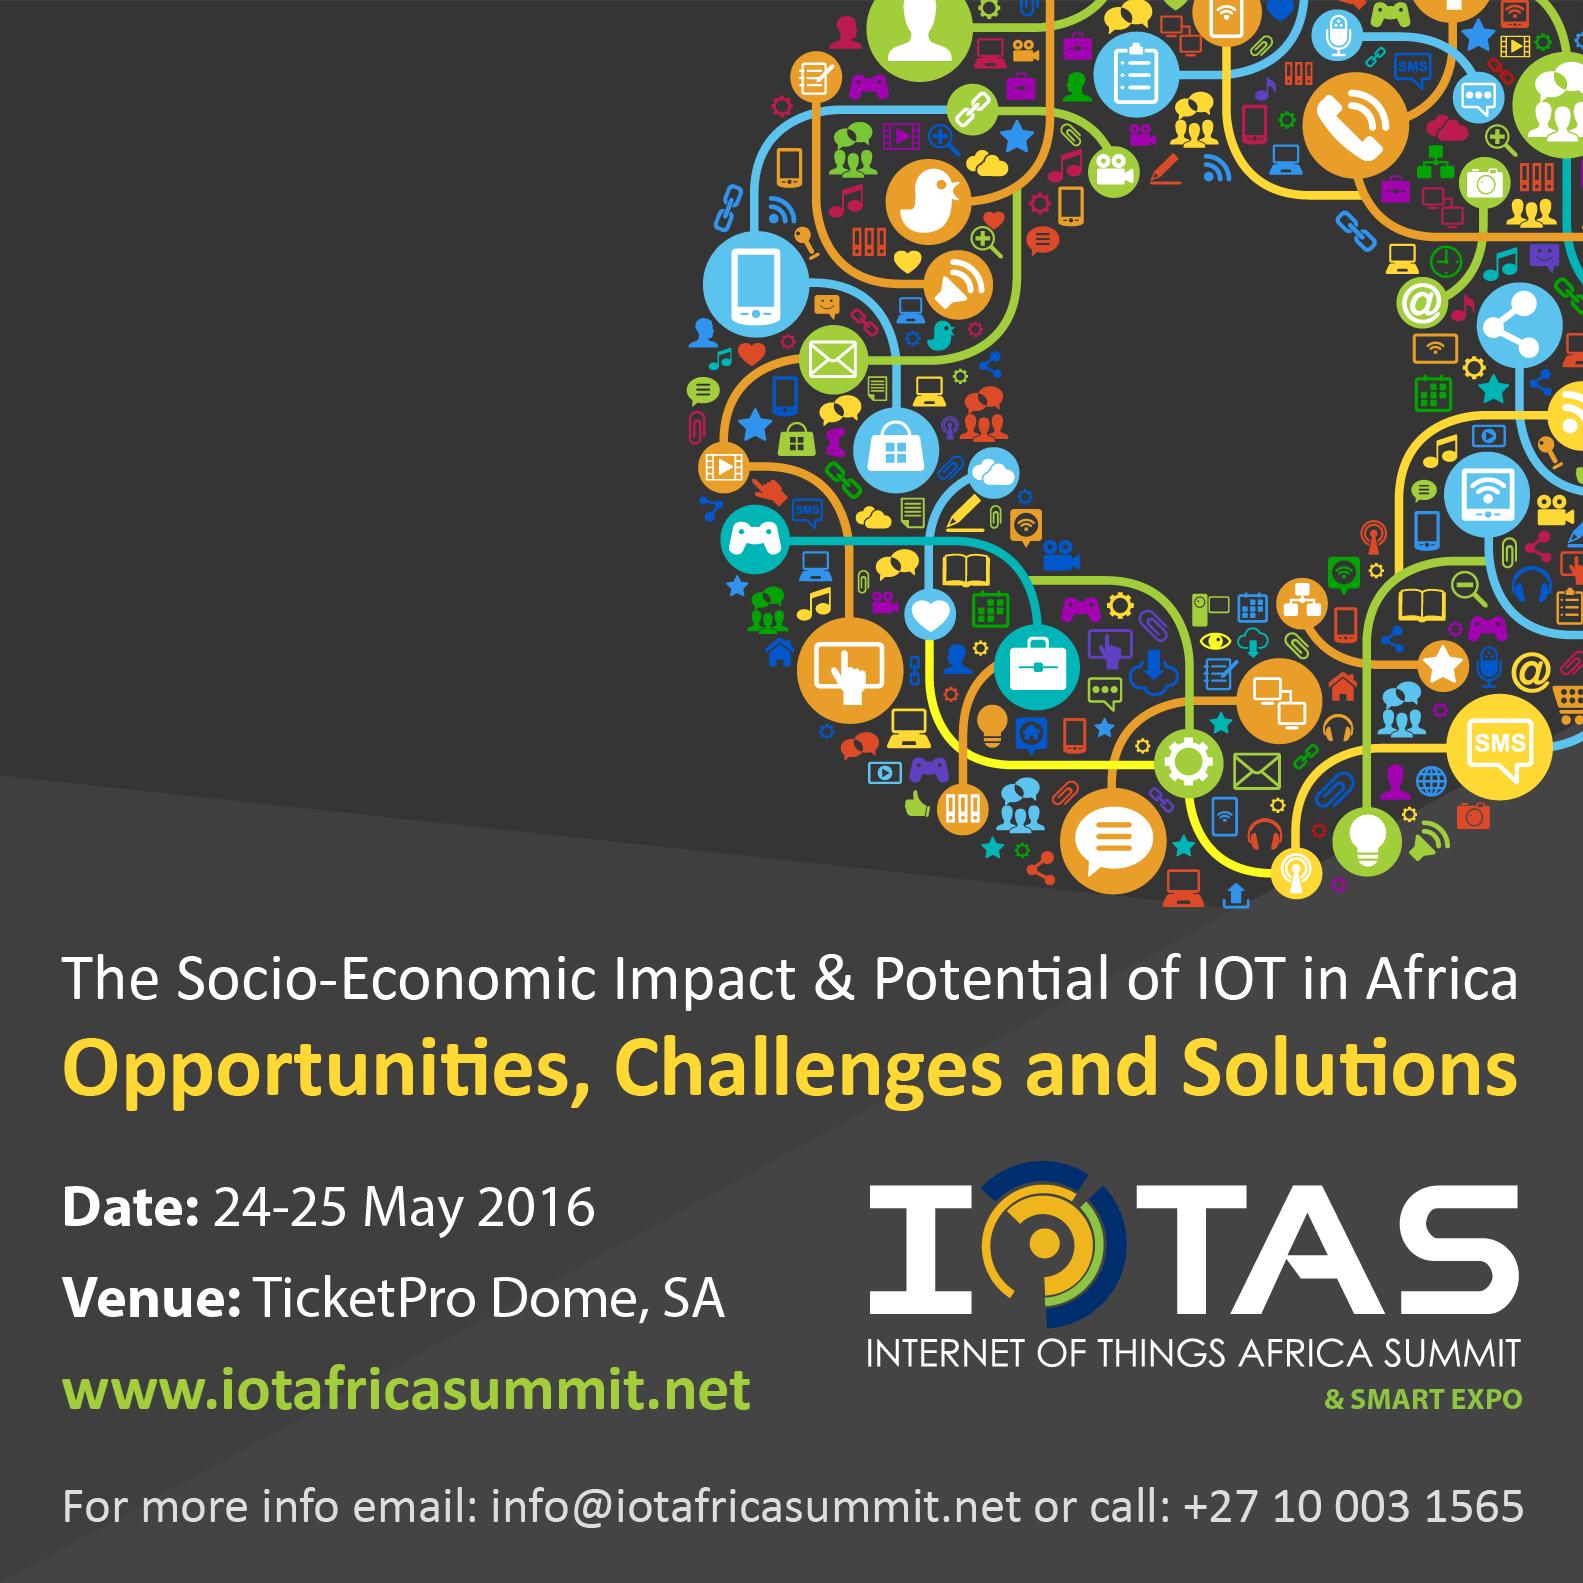 IoTAS 2016 & SMART Expo